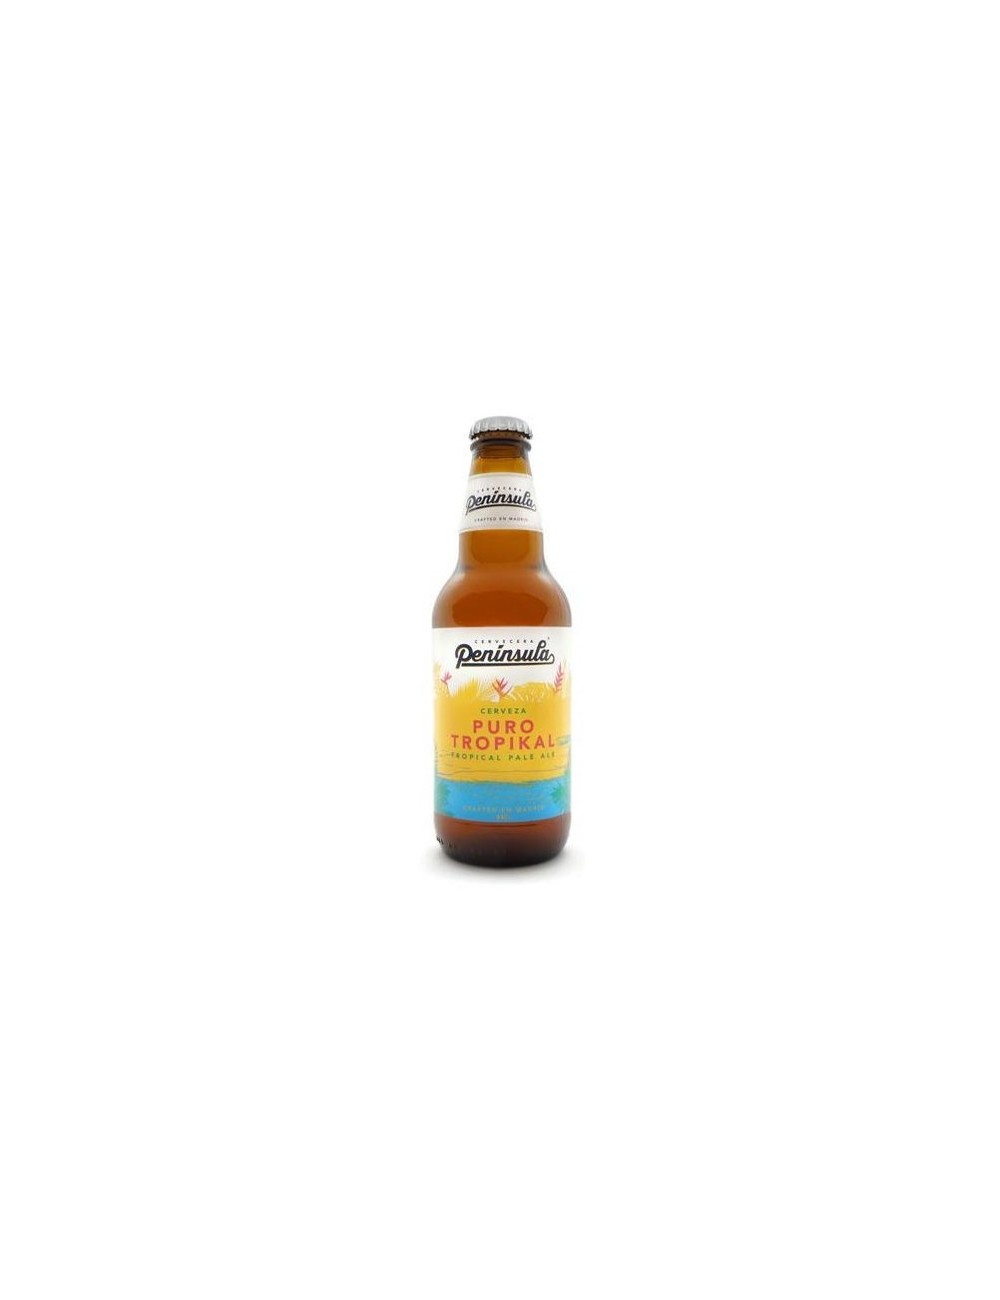 Cerveza Península Puro Tropikal